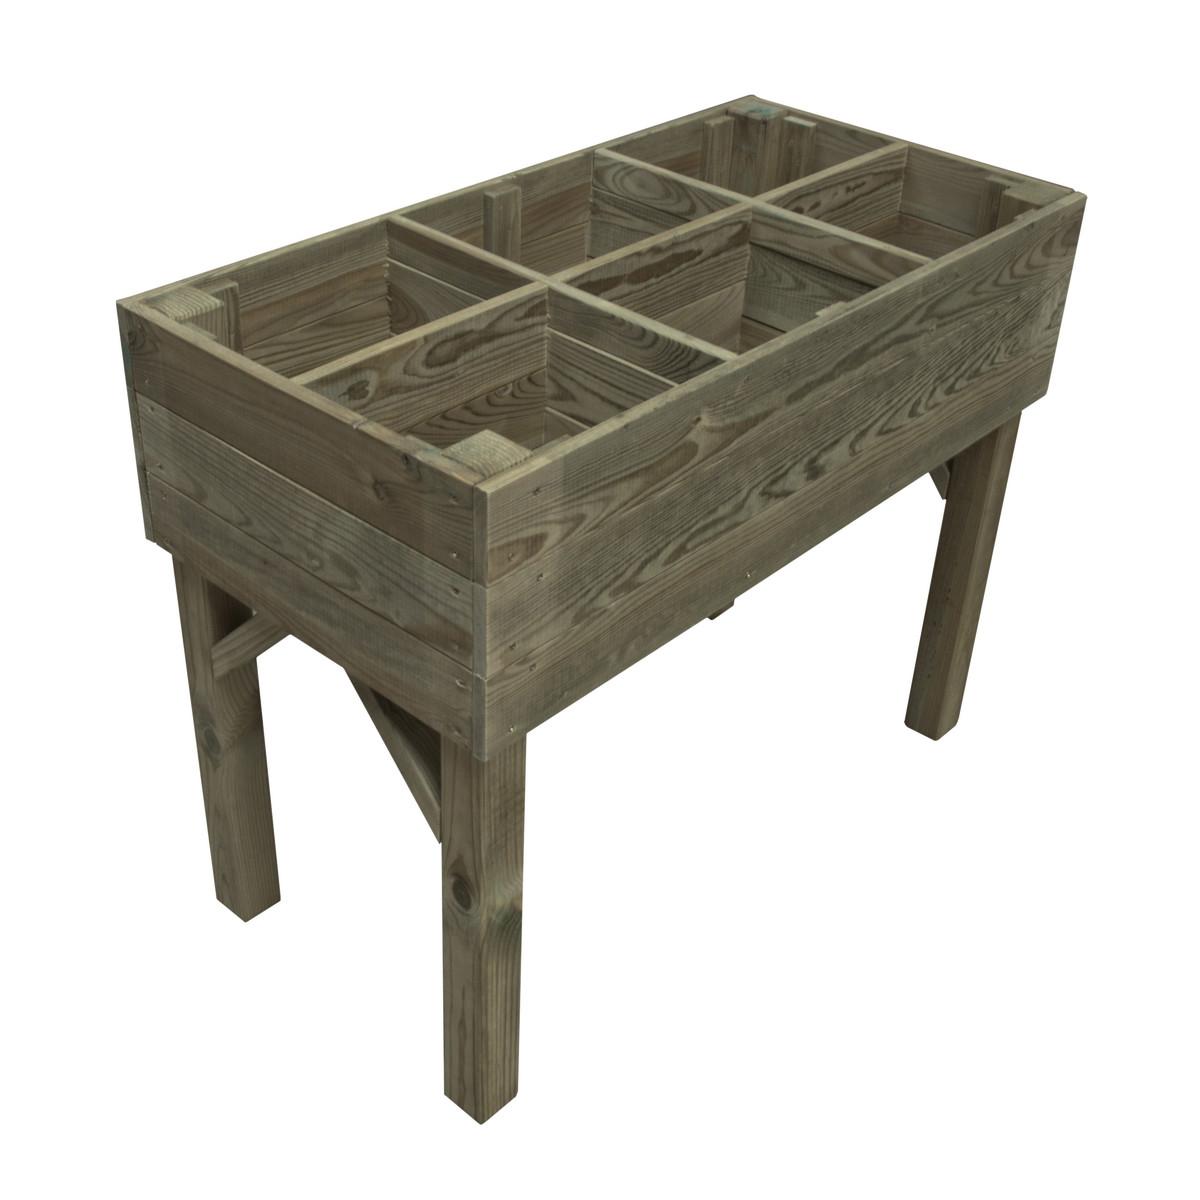 Amazing gazebo pieghevole leroy merlin elegant tavoli for Leroy merlin gazebo giardino in legno